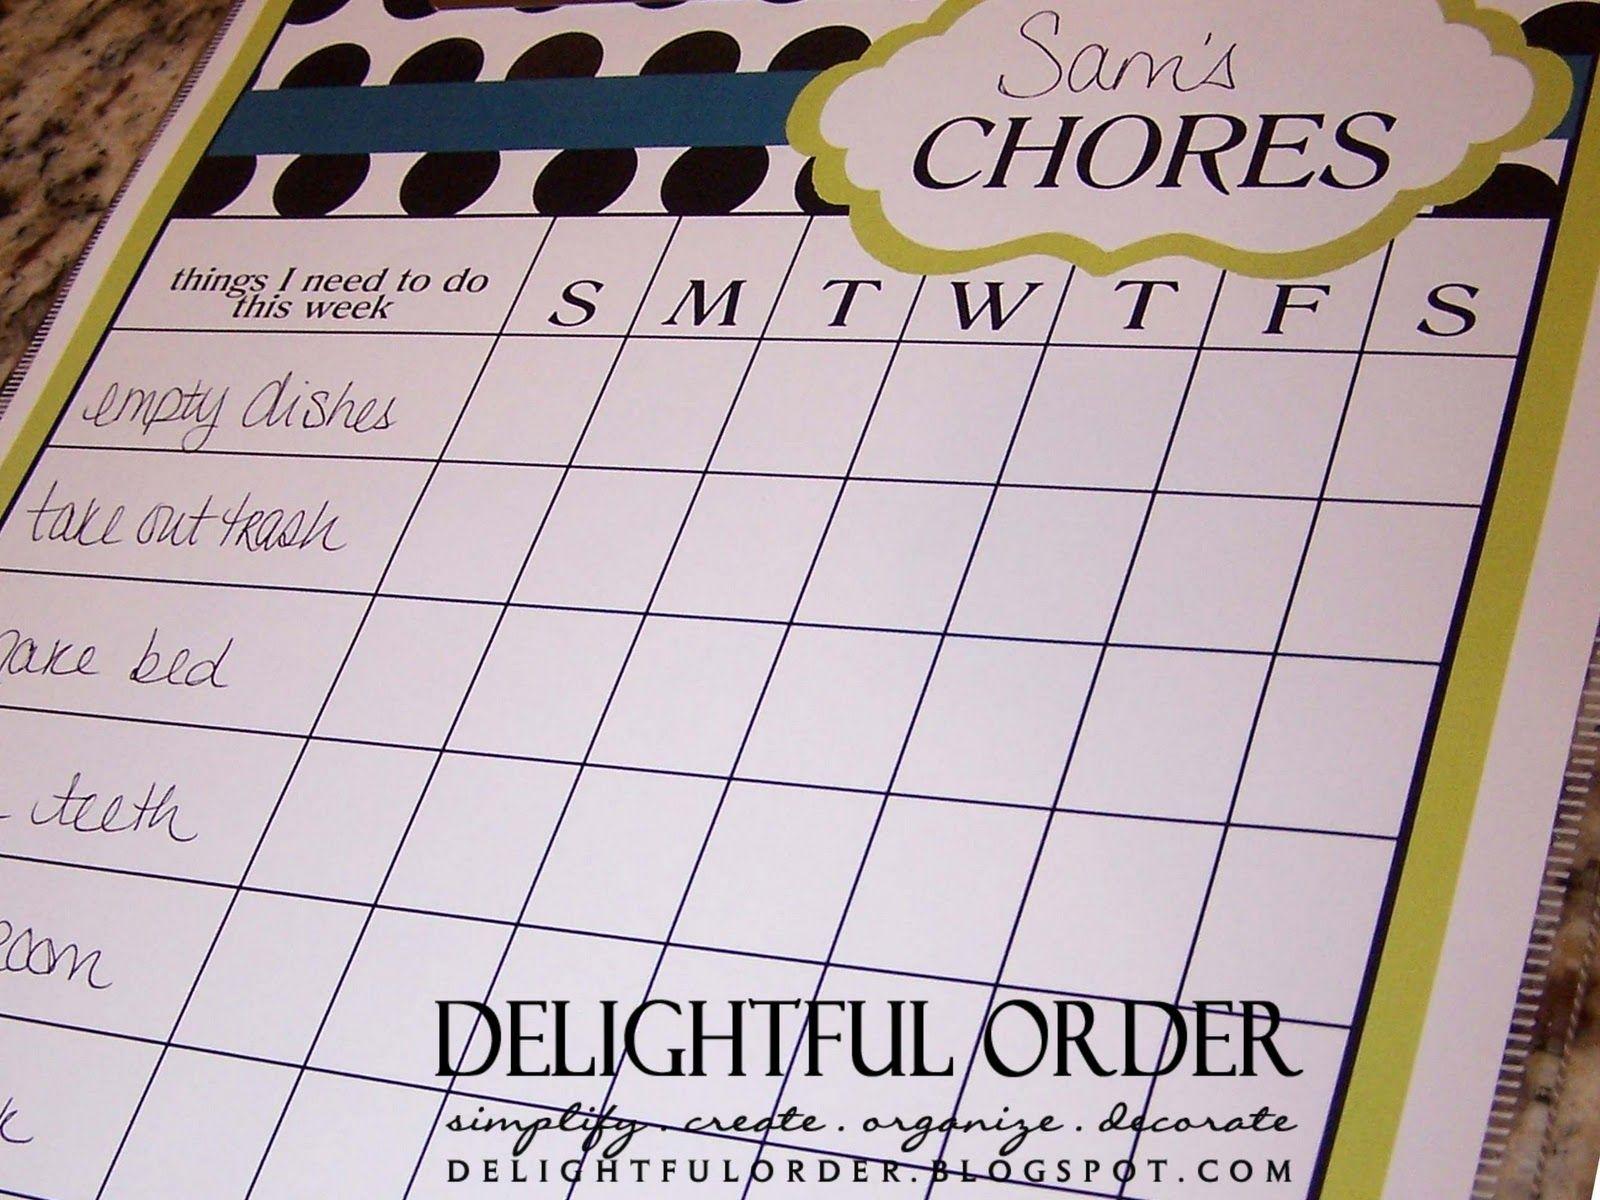 Crafty Chore Chart Ideas | find the boys charts for sale here and find the girls charts for sale ...